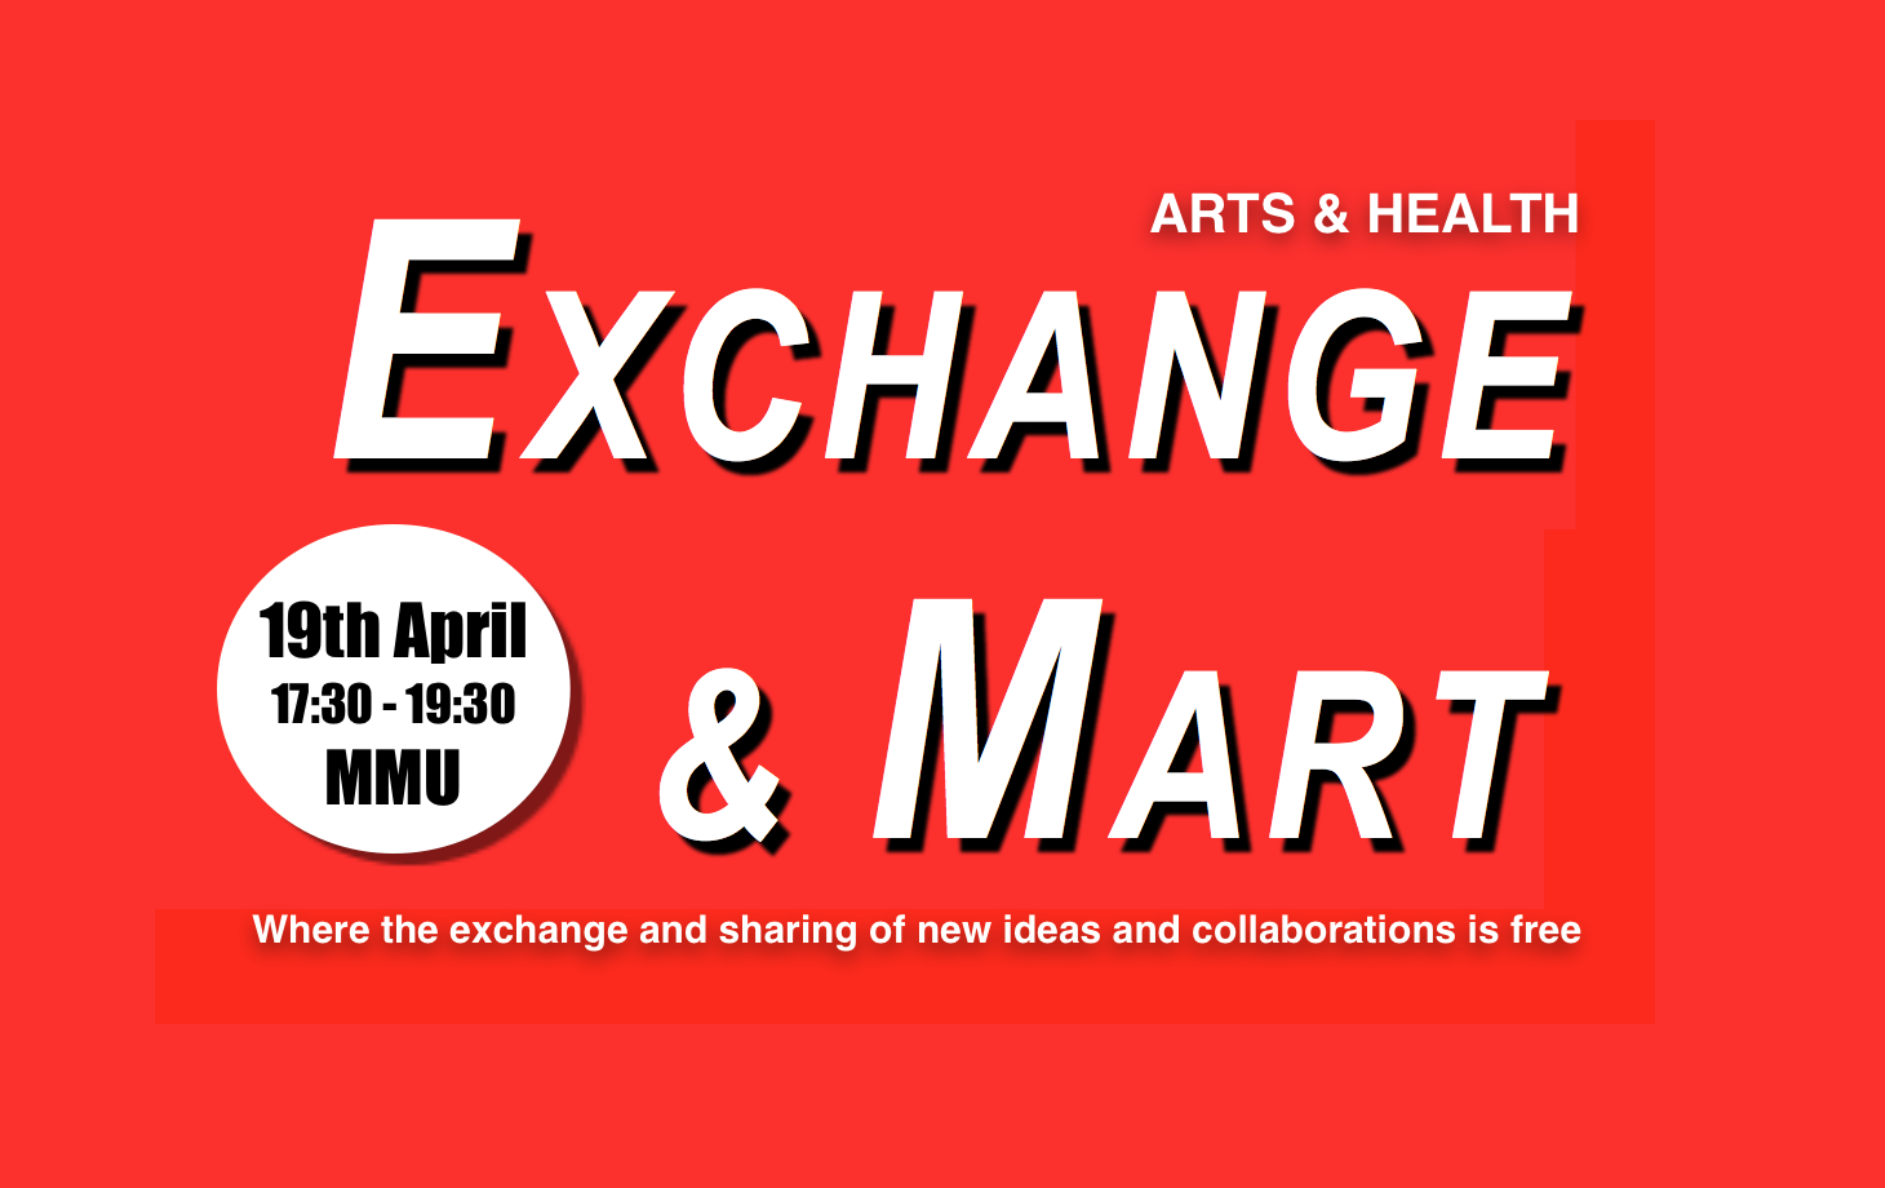 EXCHANGE & MART